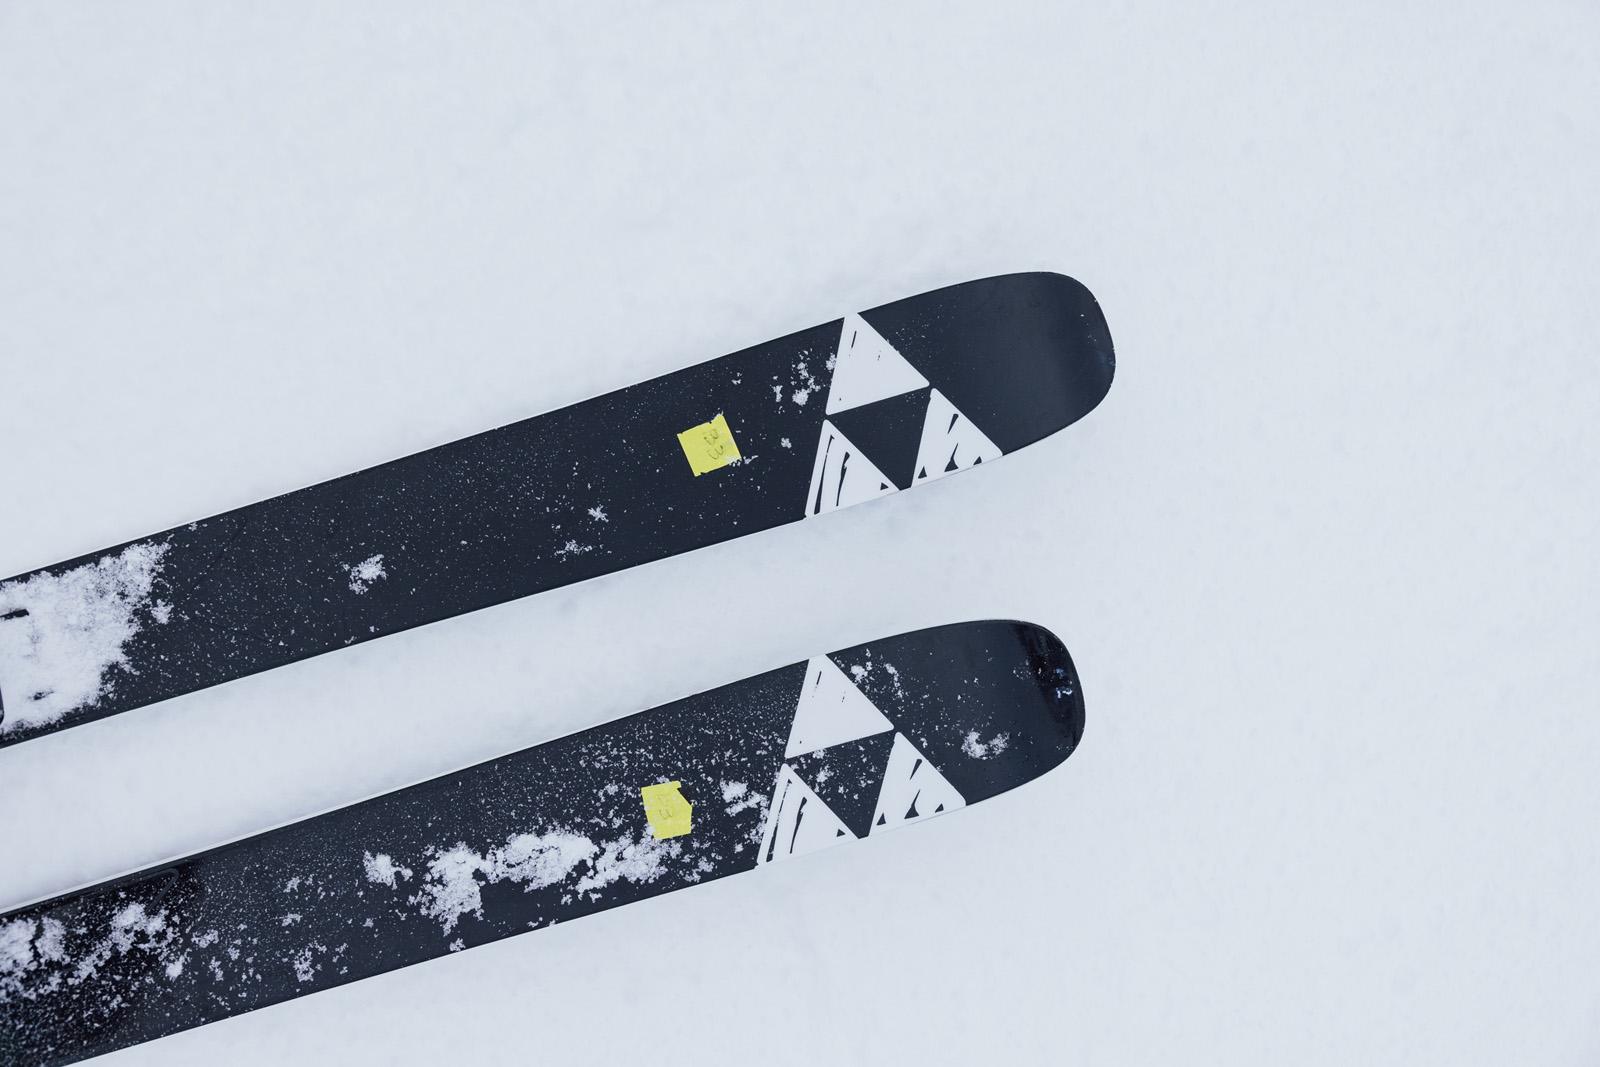 the ski monster, skiing, ski testing, sunapee, fischer